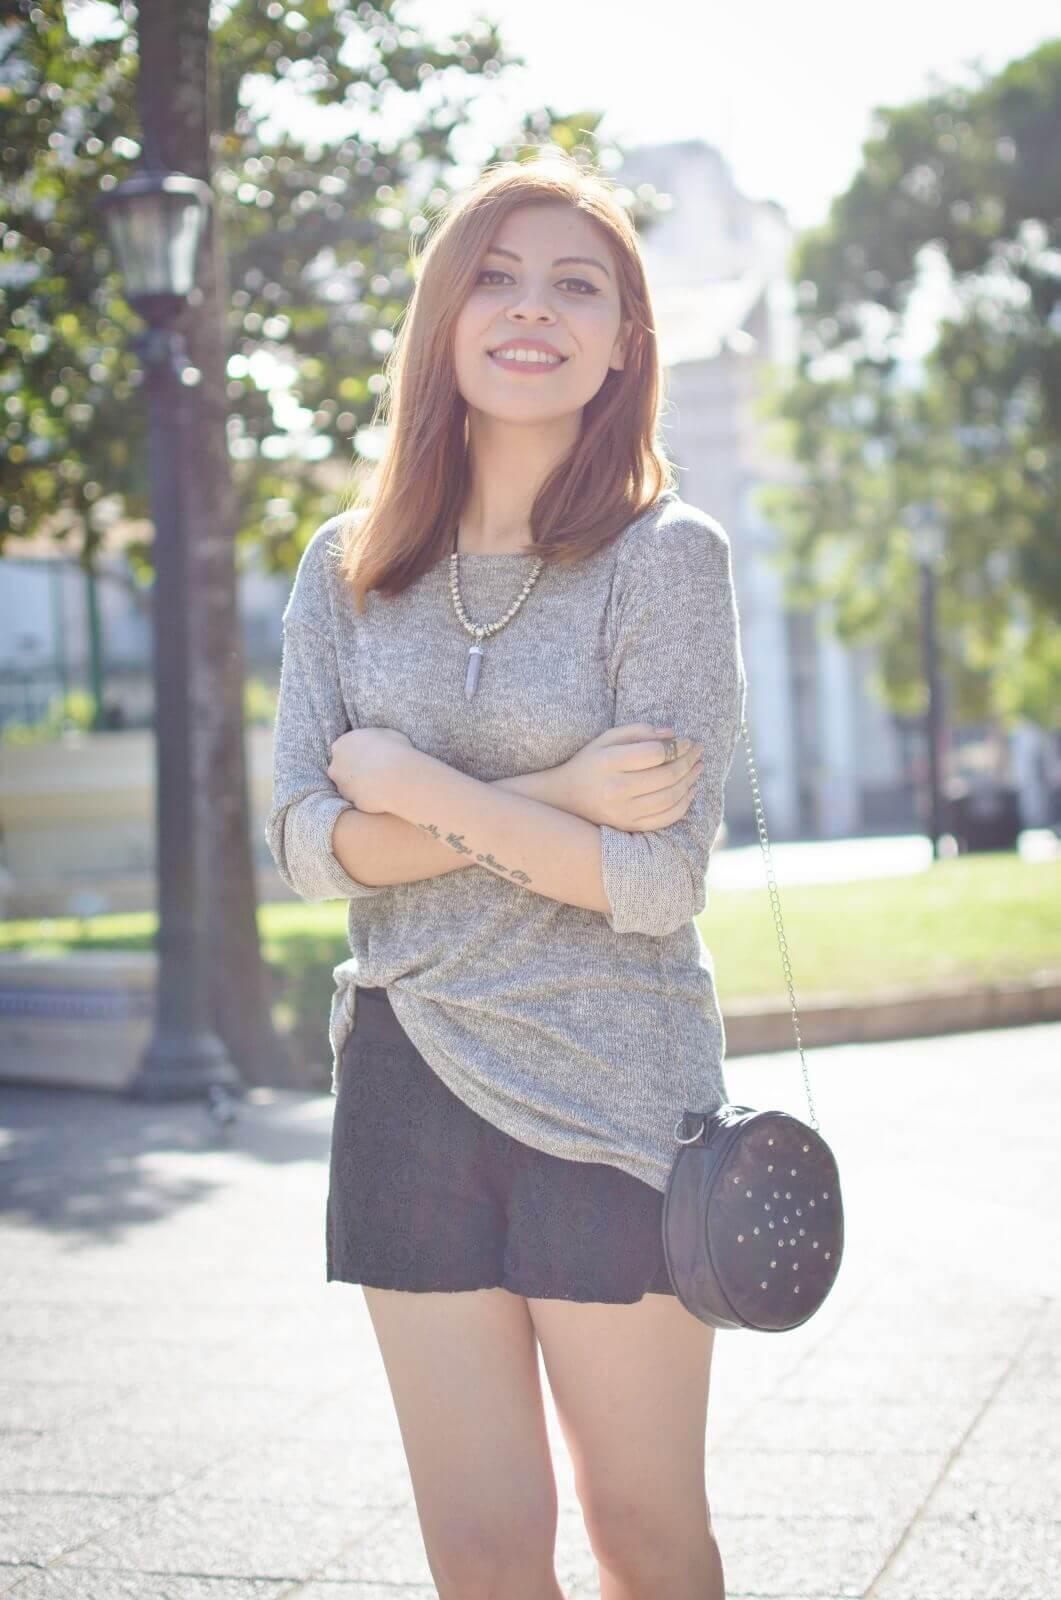 zaful-statement-shoes-silver-mirrored-sunglasses-deborah-ferrero-streetstyle-style-by-deb11